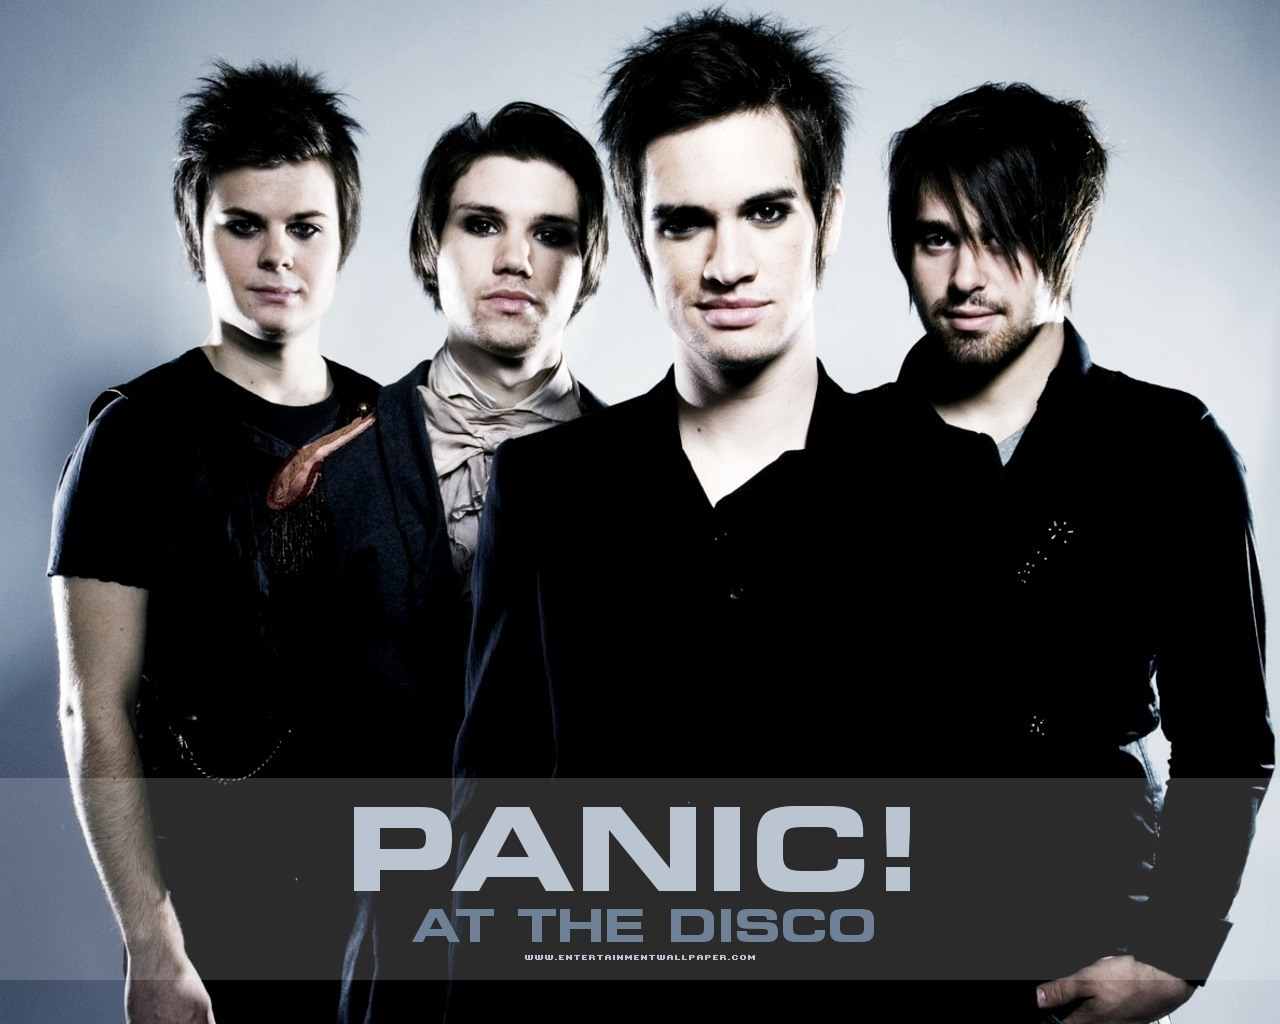 Panic at the Disco panic at the disco 947447 1280 1024